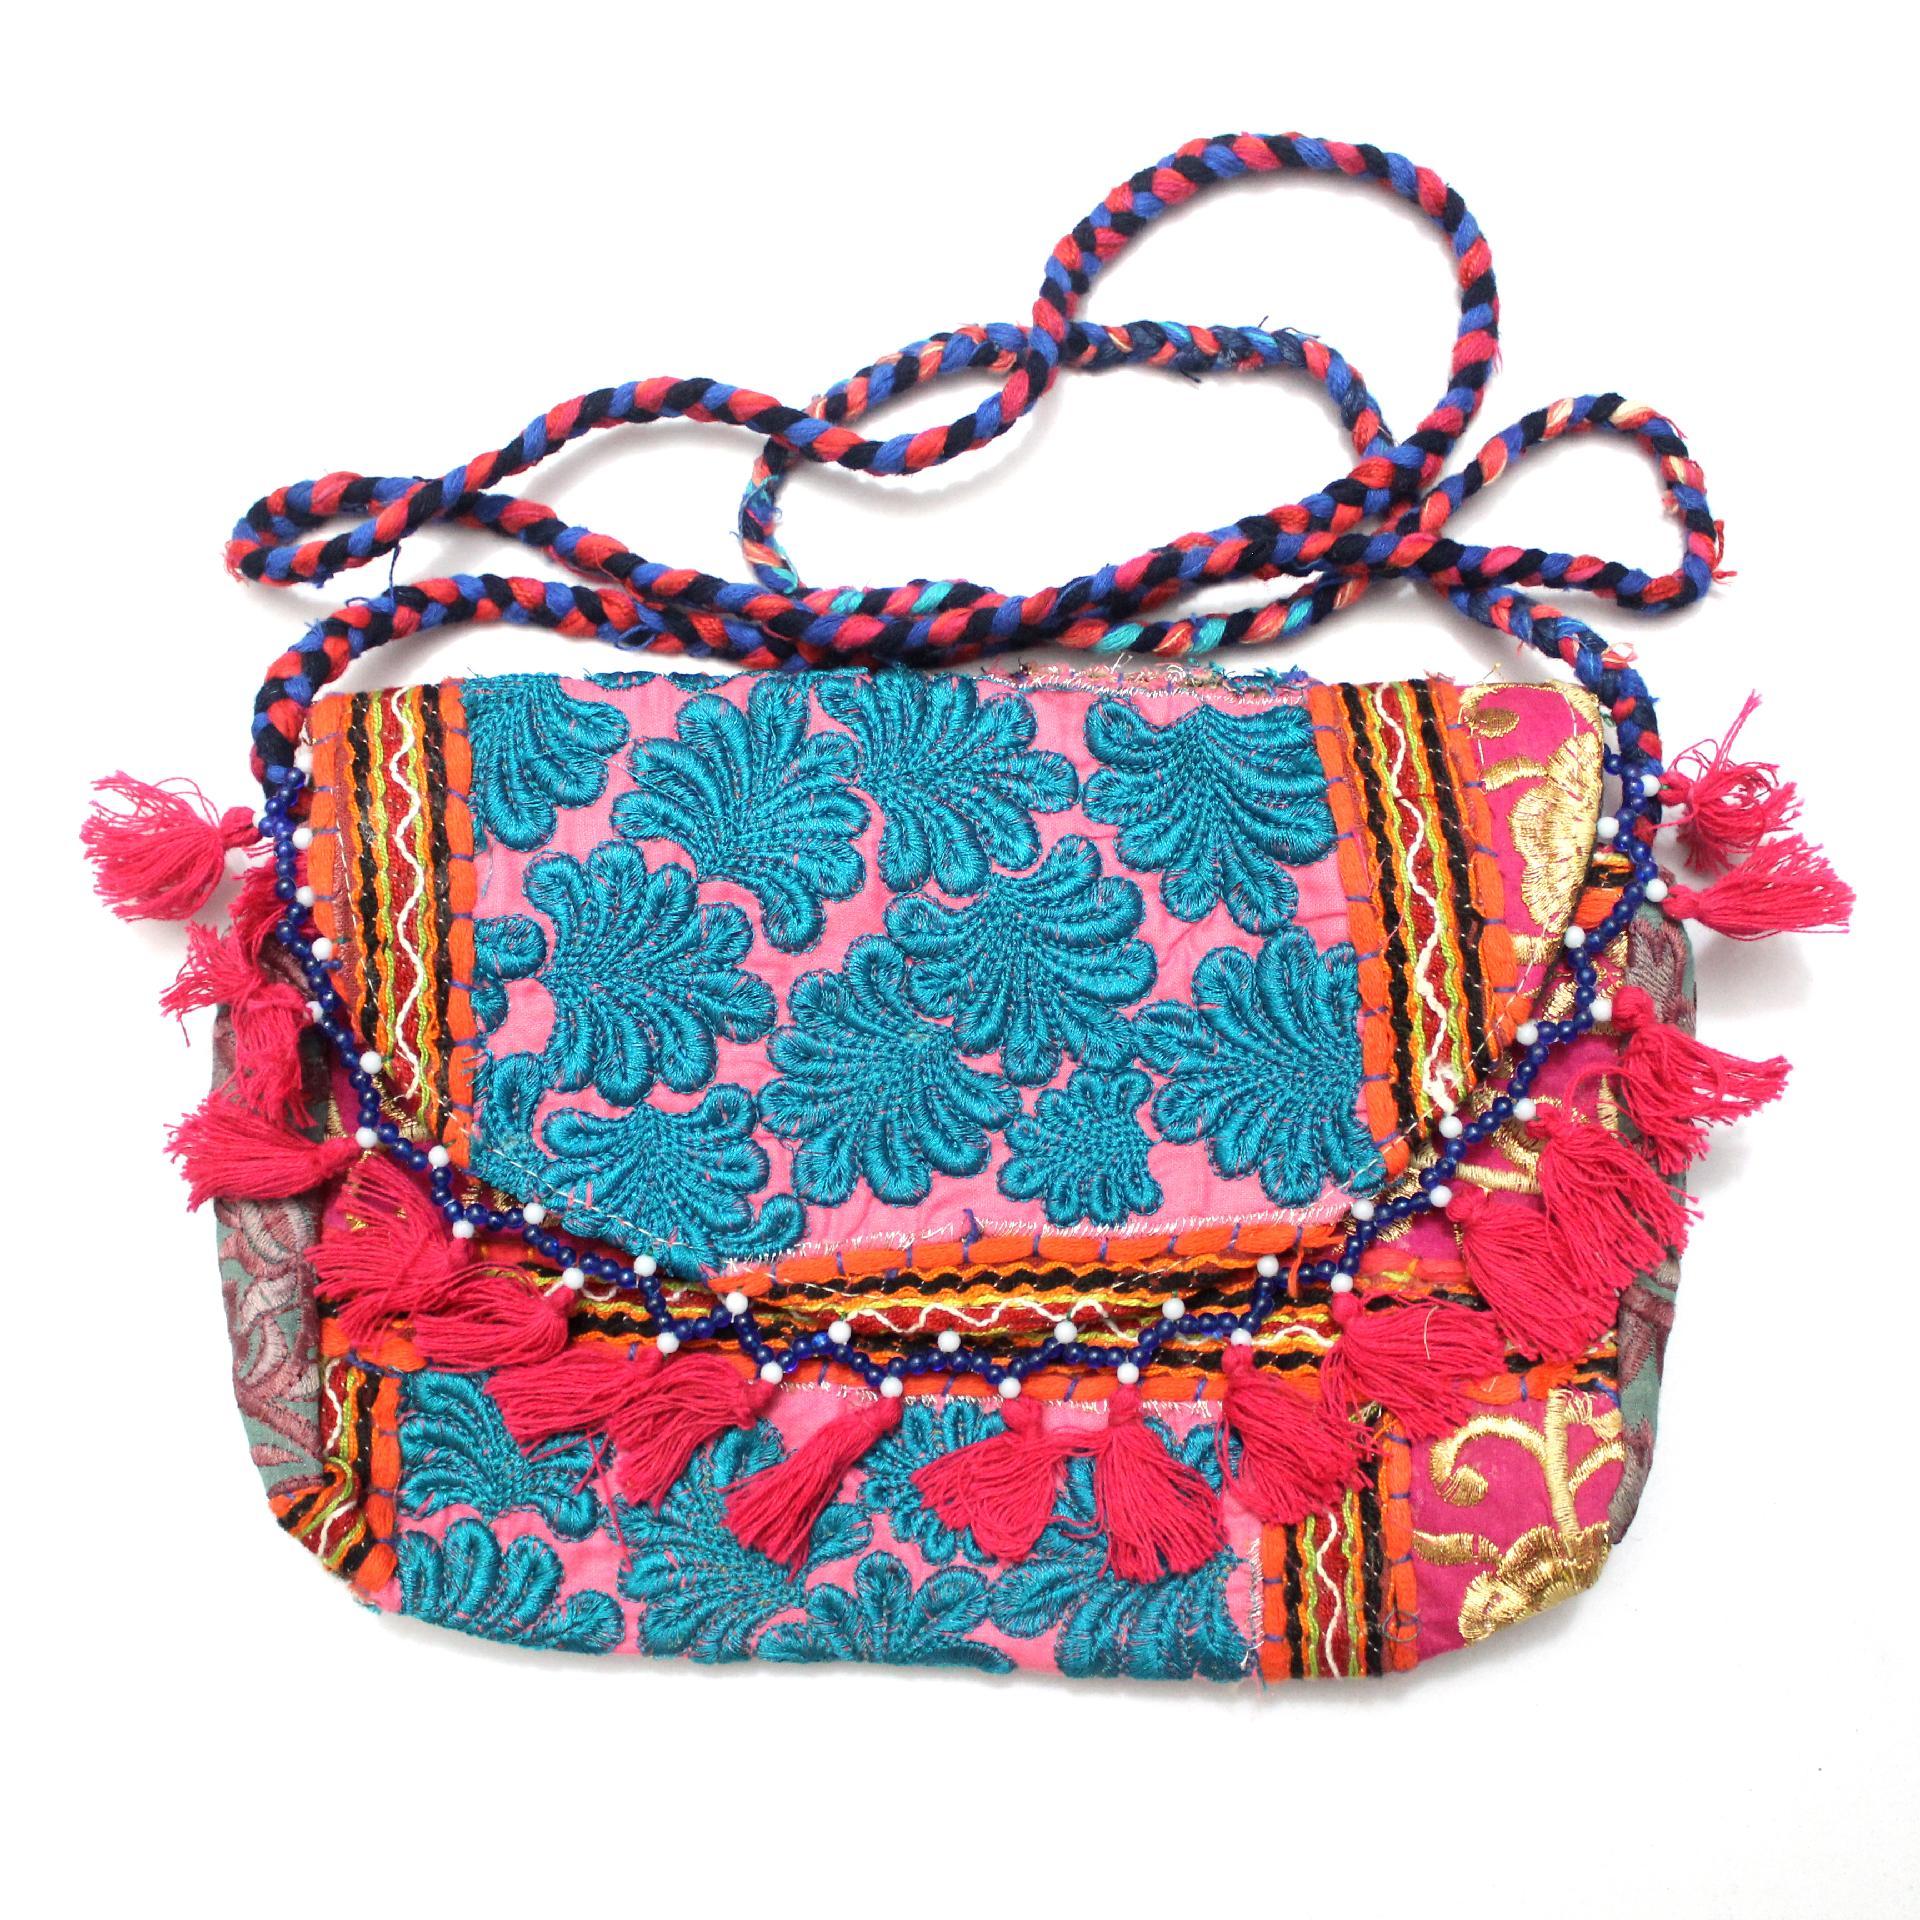 1a0d635c61 Image is loading Vintage-Tribal-Banjara-Indian-Handmade-Ethnic-Women-Purse-